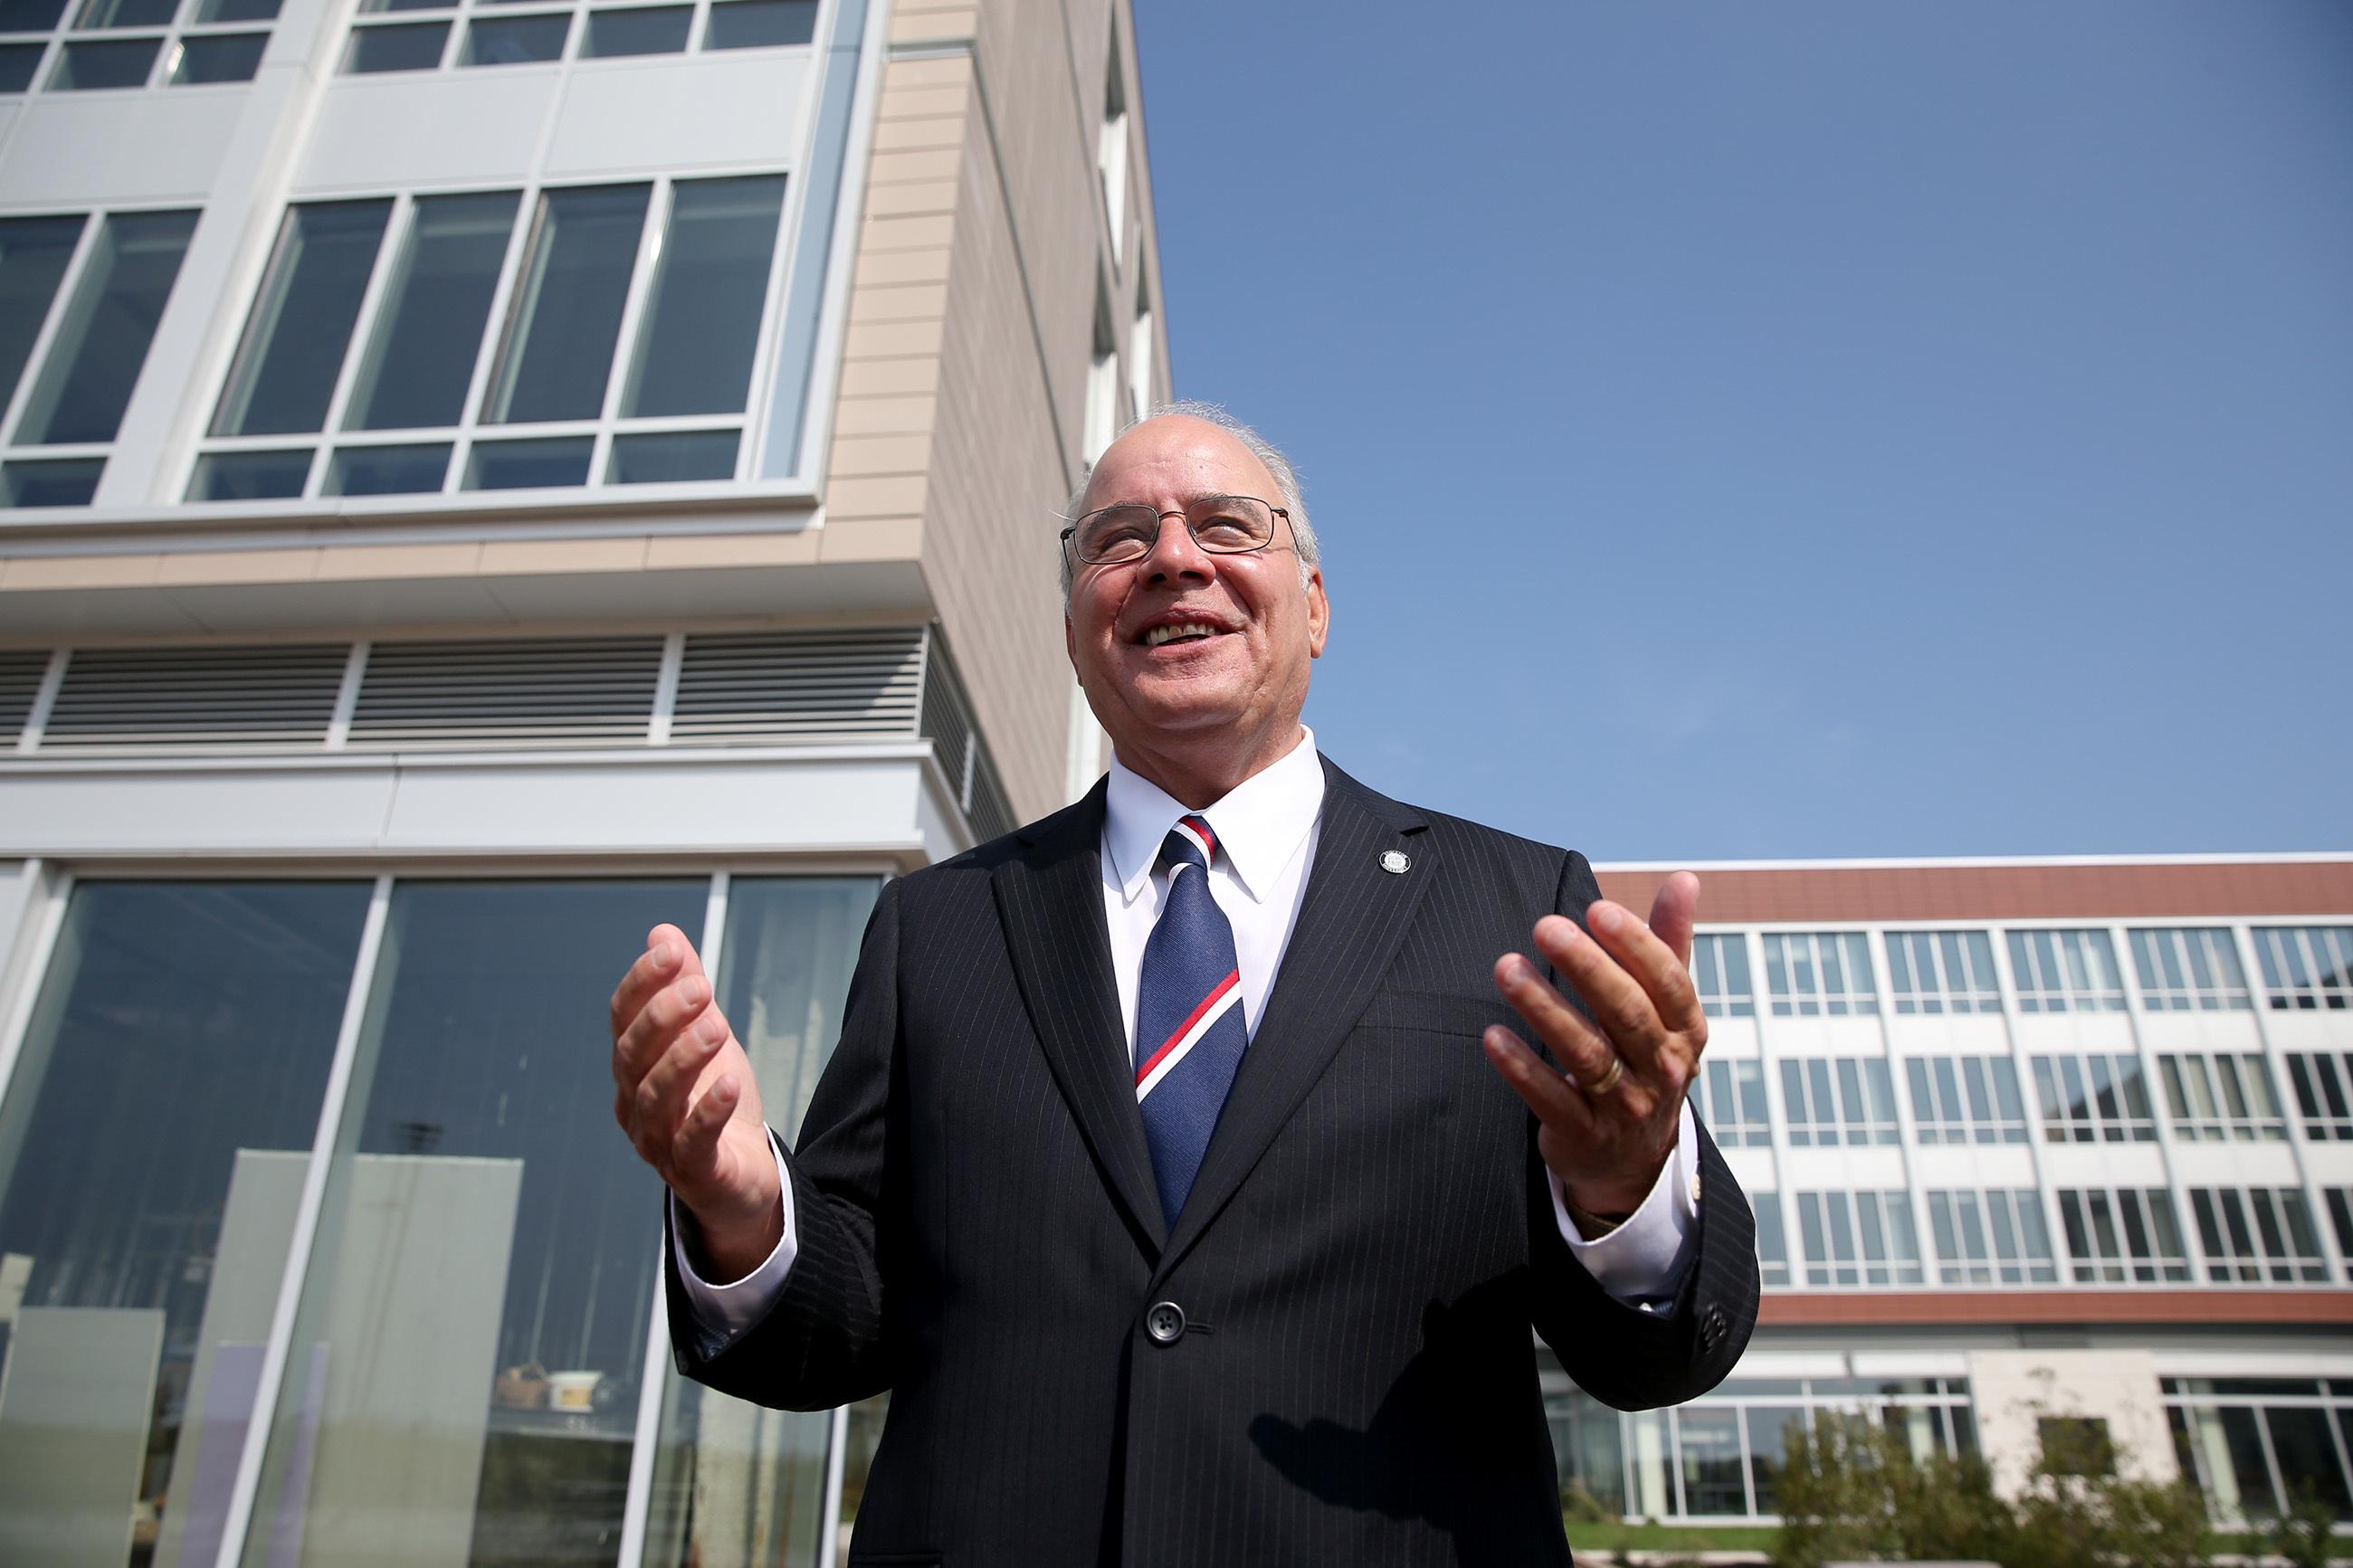 Stockton University president Harvey Kesselman speaks outside Stockton University�s Atlantic City campus in Atlantic City, NJ on August 27, 2018.